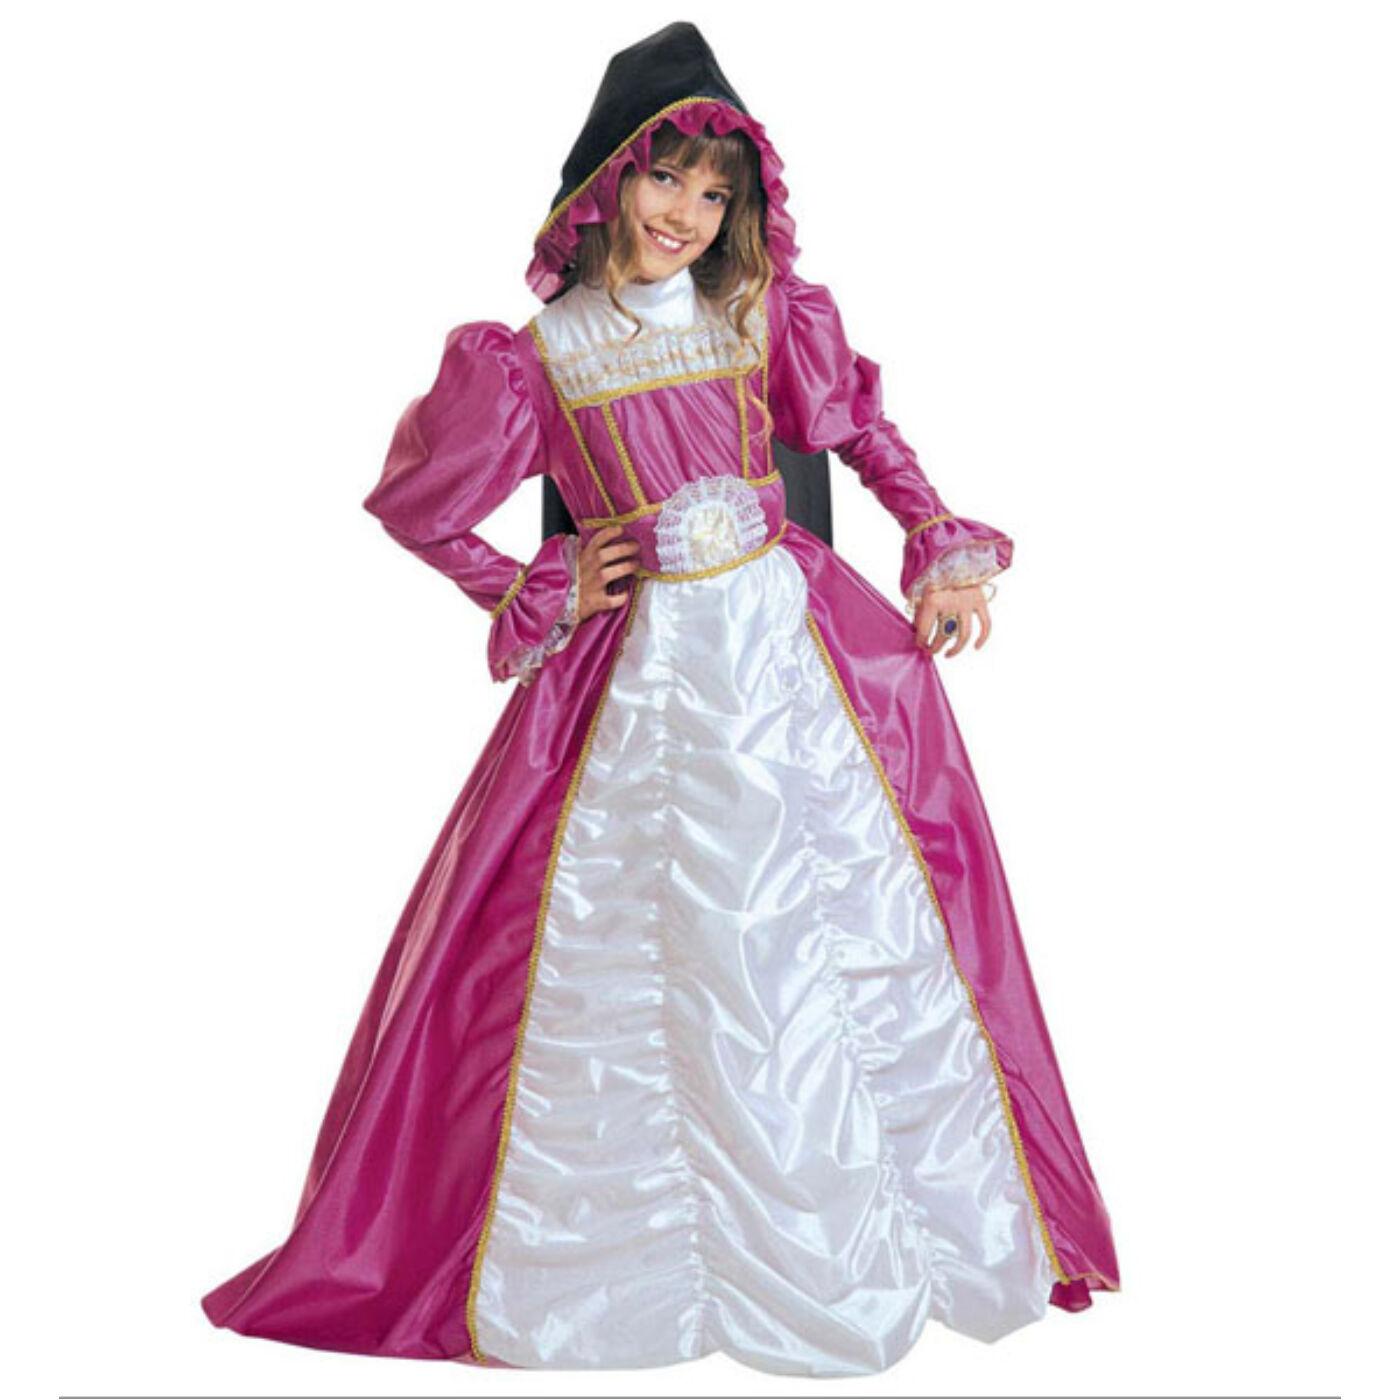 Yorki hercegnő Jelmez 128-as